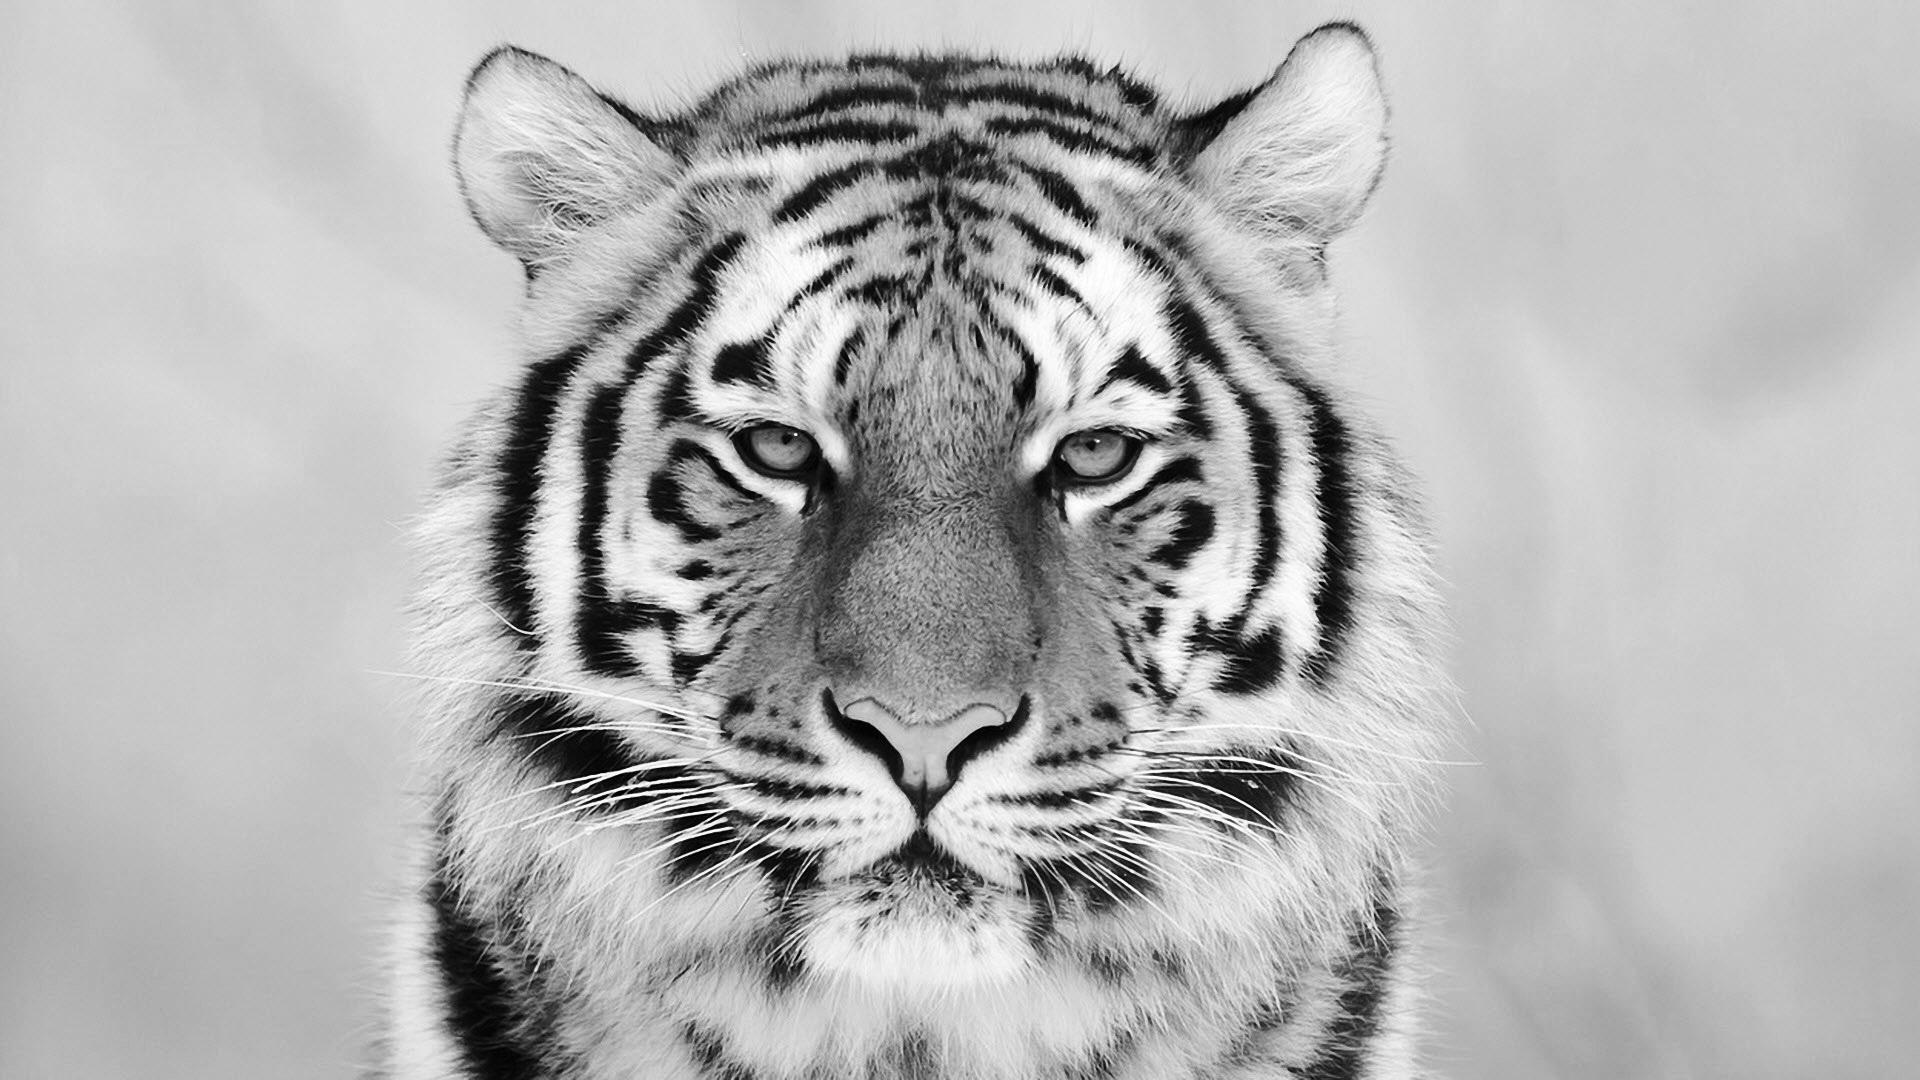 White Tiger Free wallpaper, hd walepaper, free wallpaper